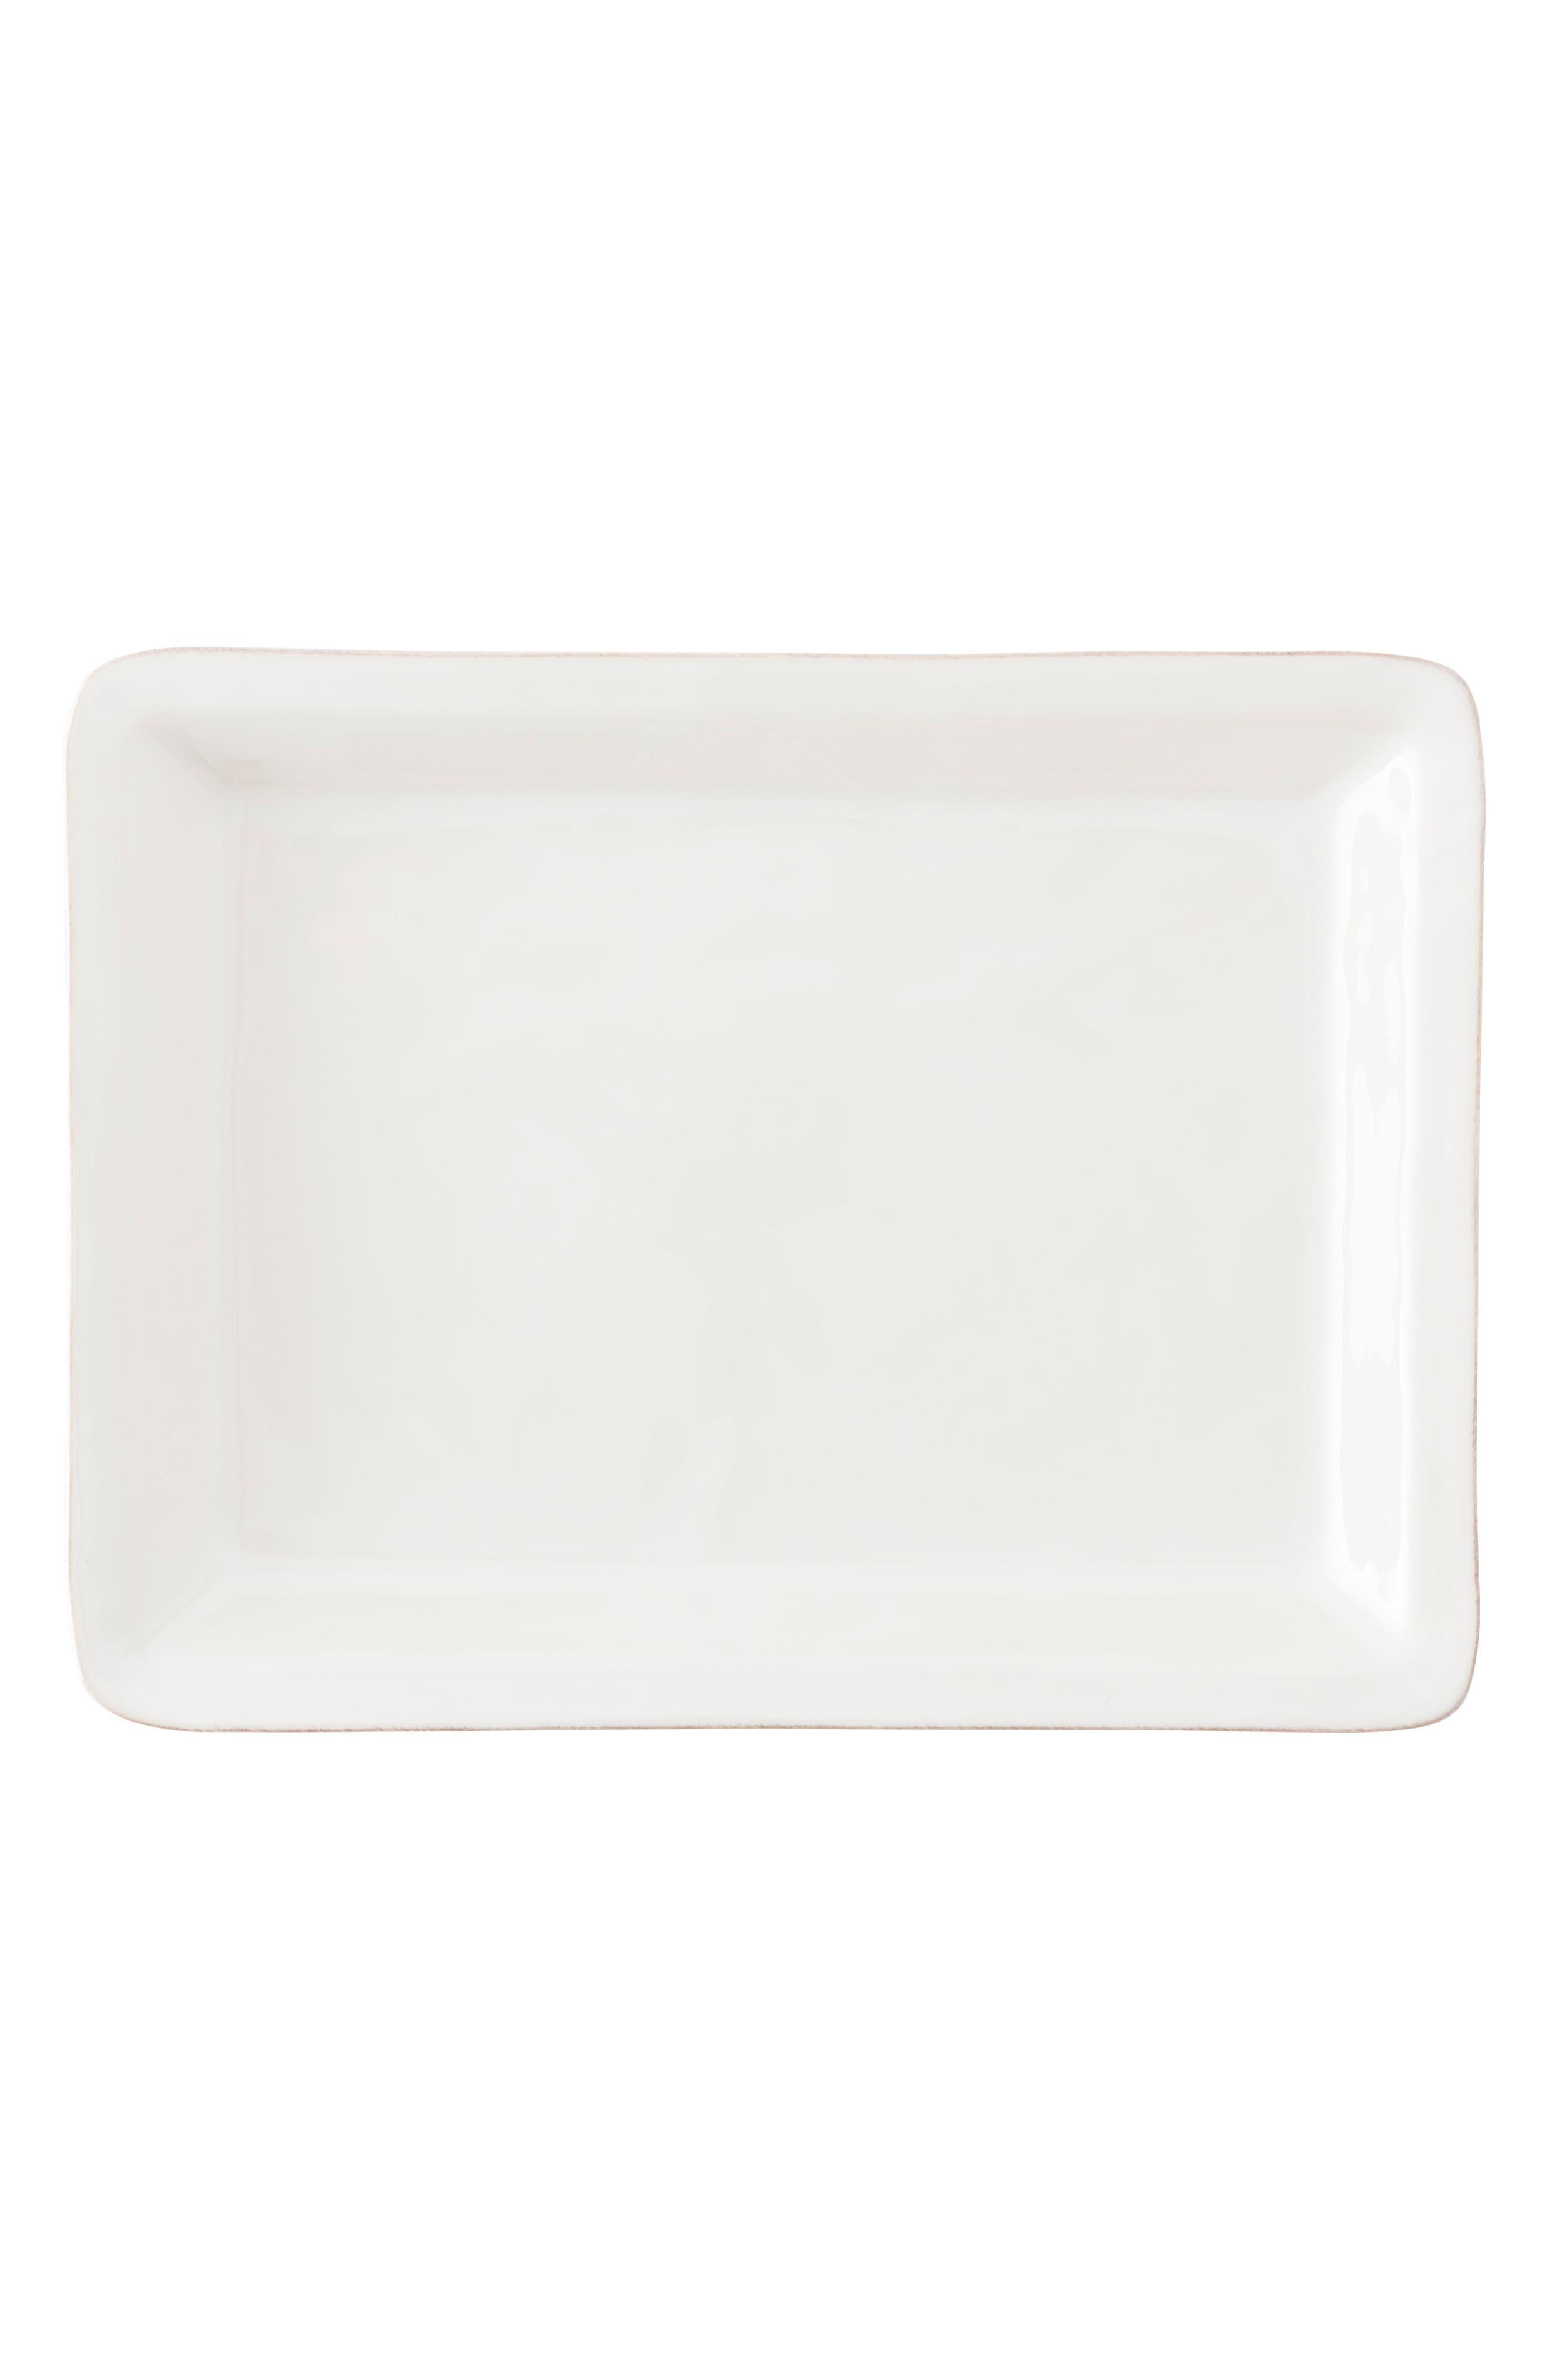 Puro Large Ceramic Serving Tray,                             Main thumbnail 1, color,                             WHITEWASH